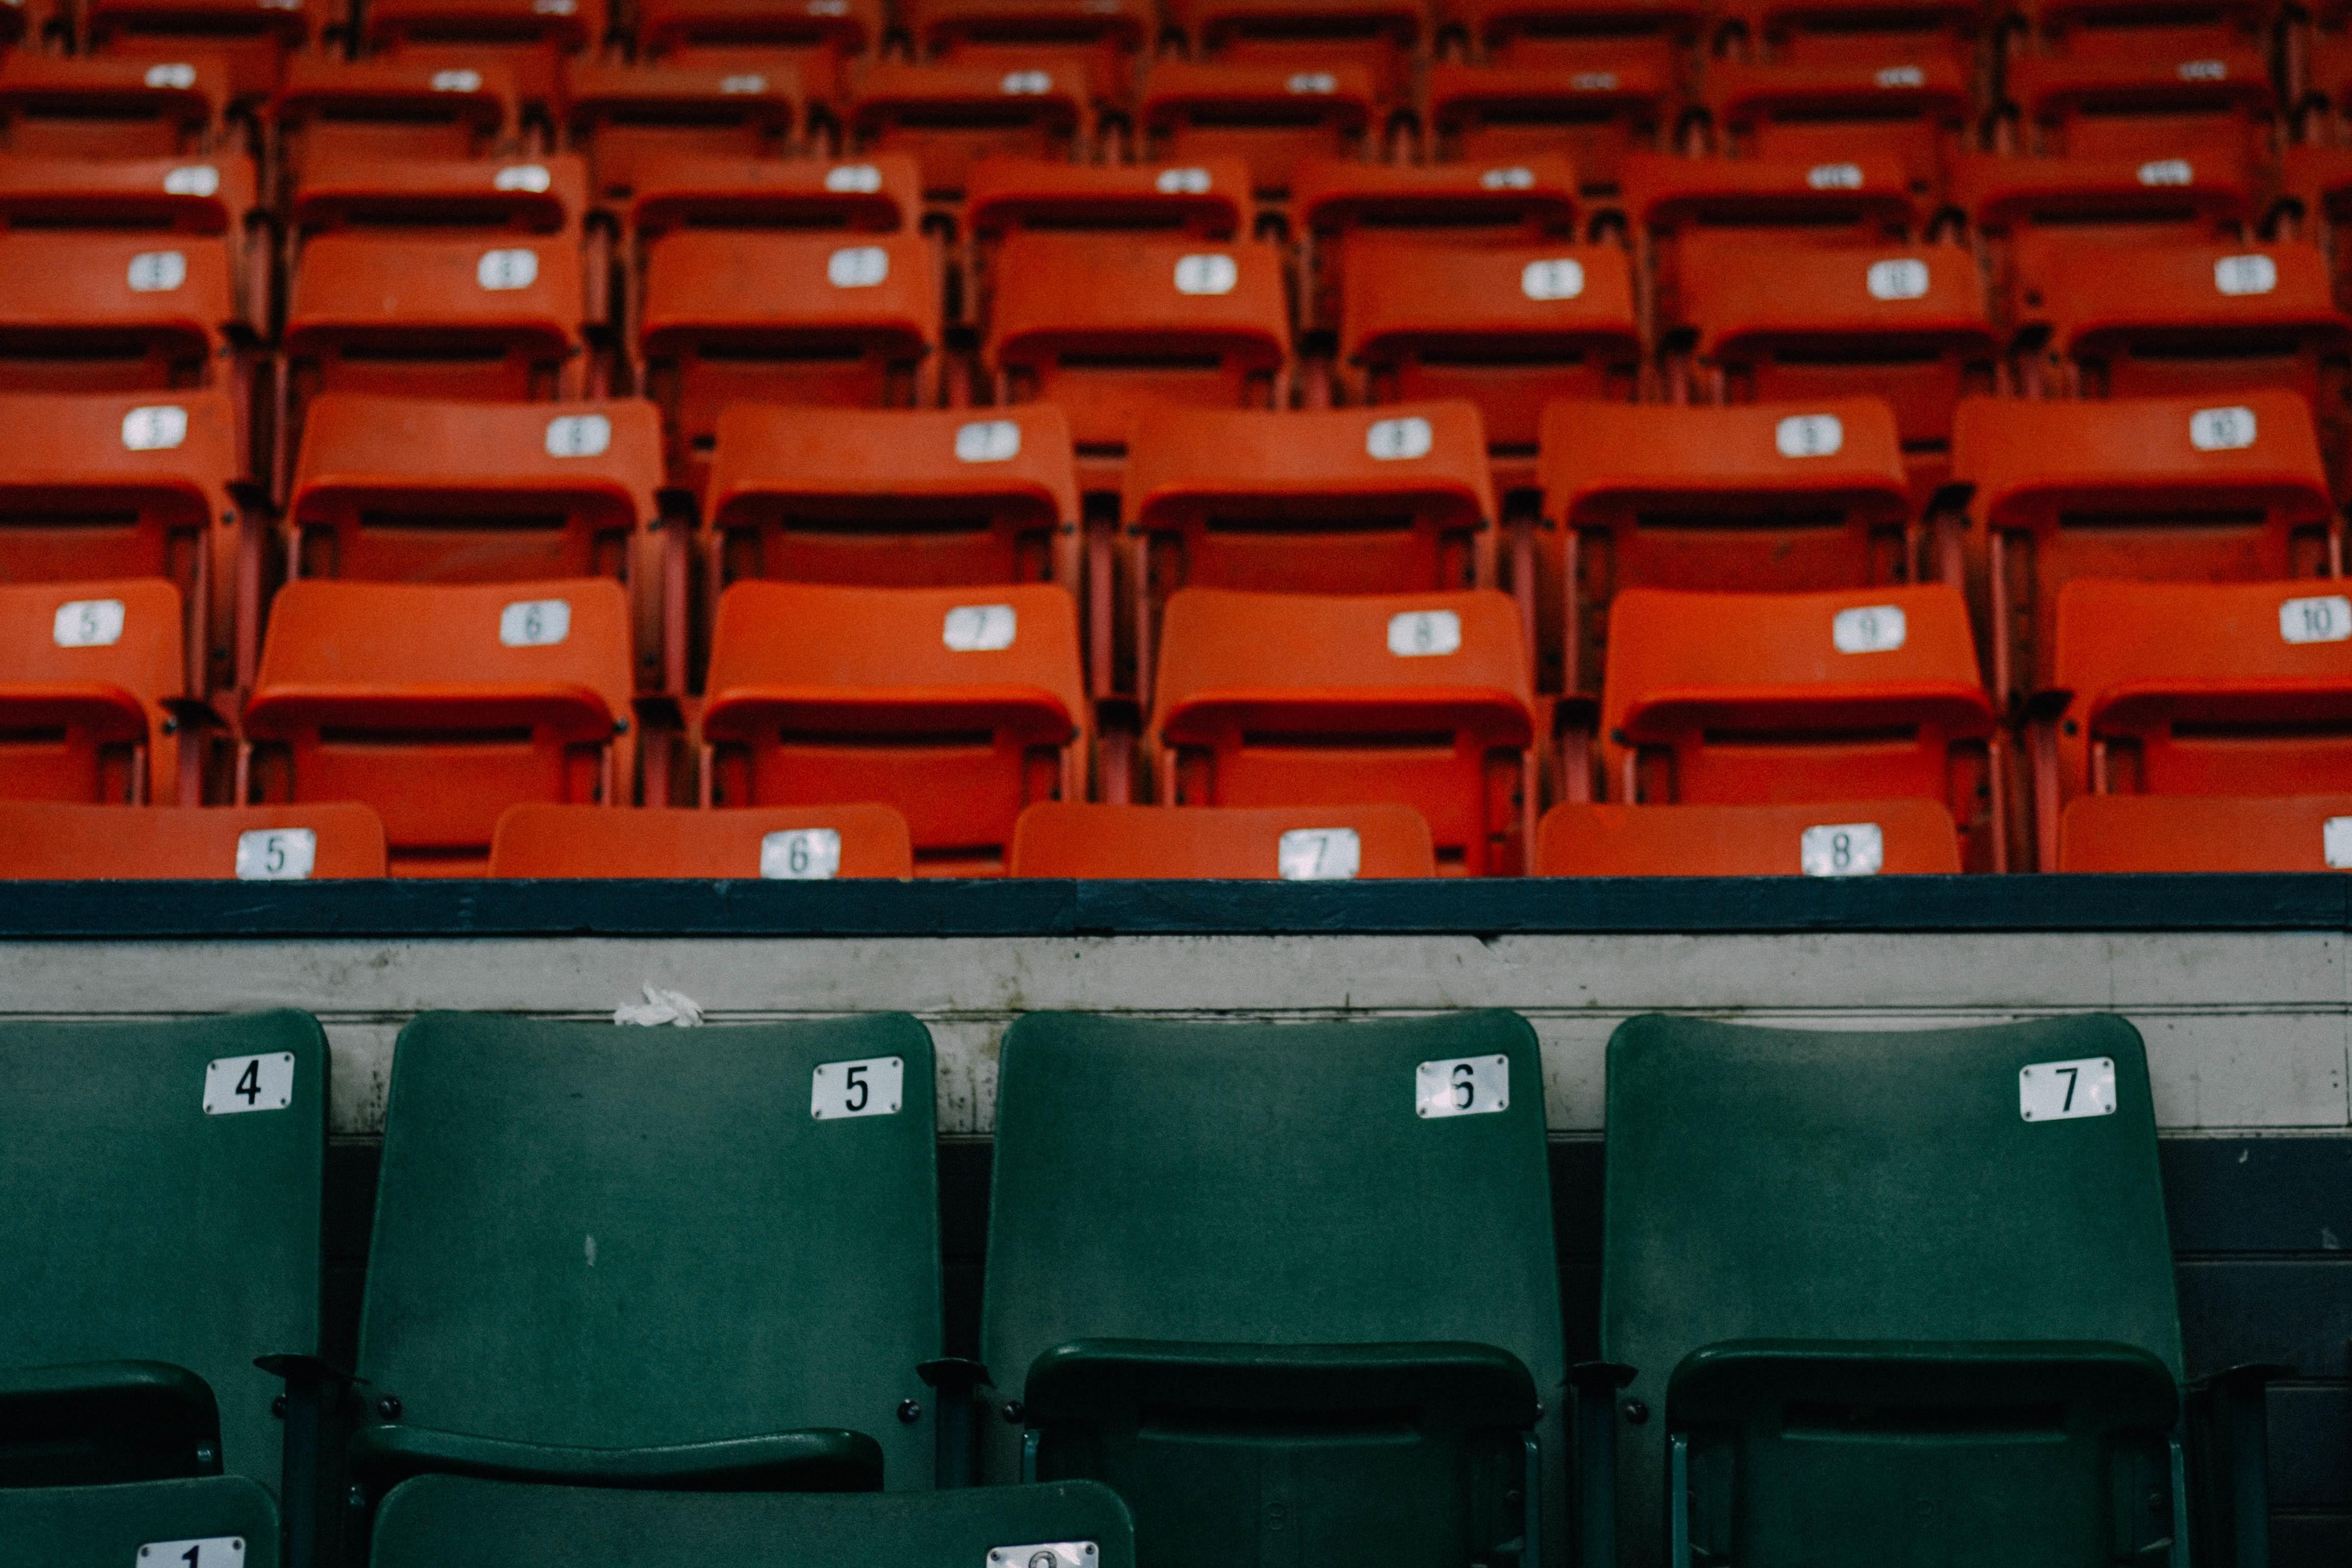 Möbel Leer kostenlose foto struktur auditorium leer möbel zimmer stadion